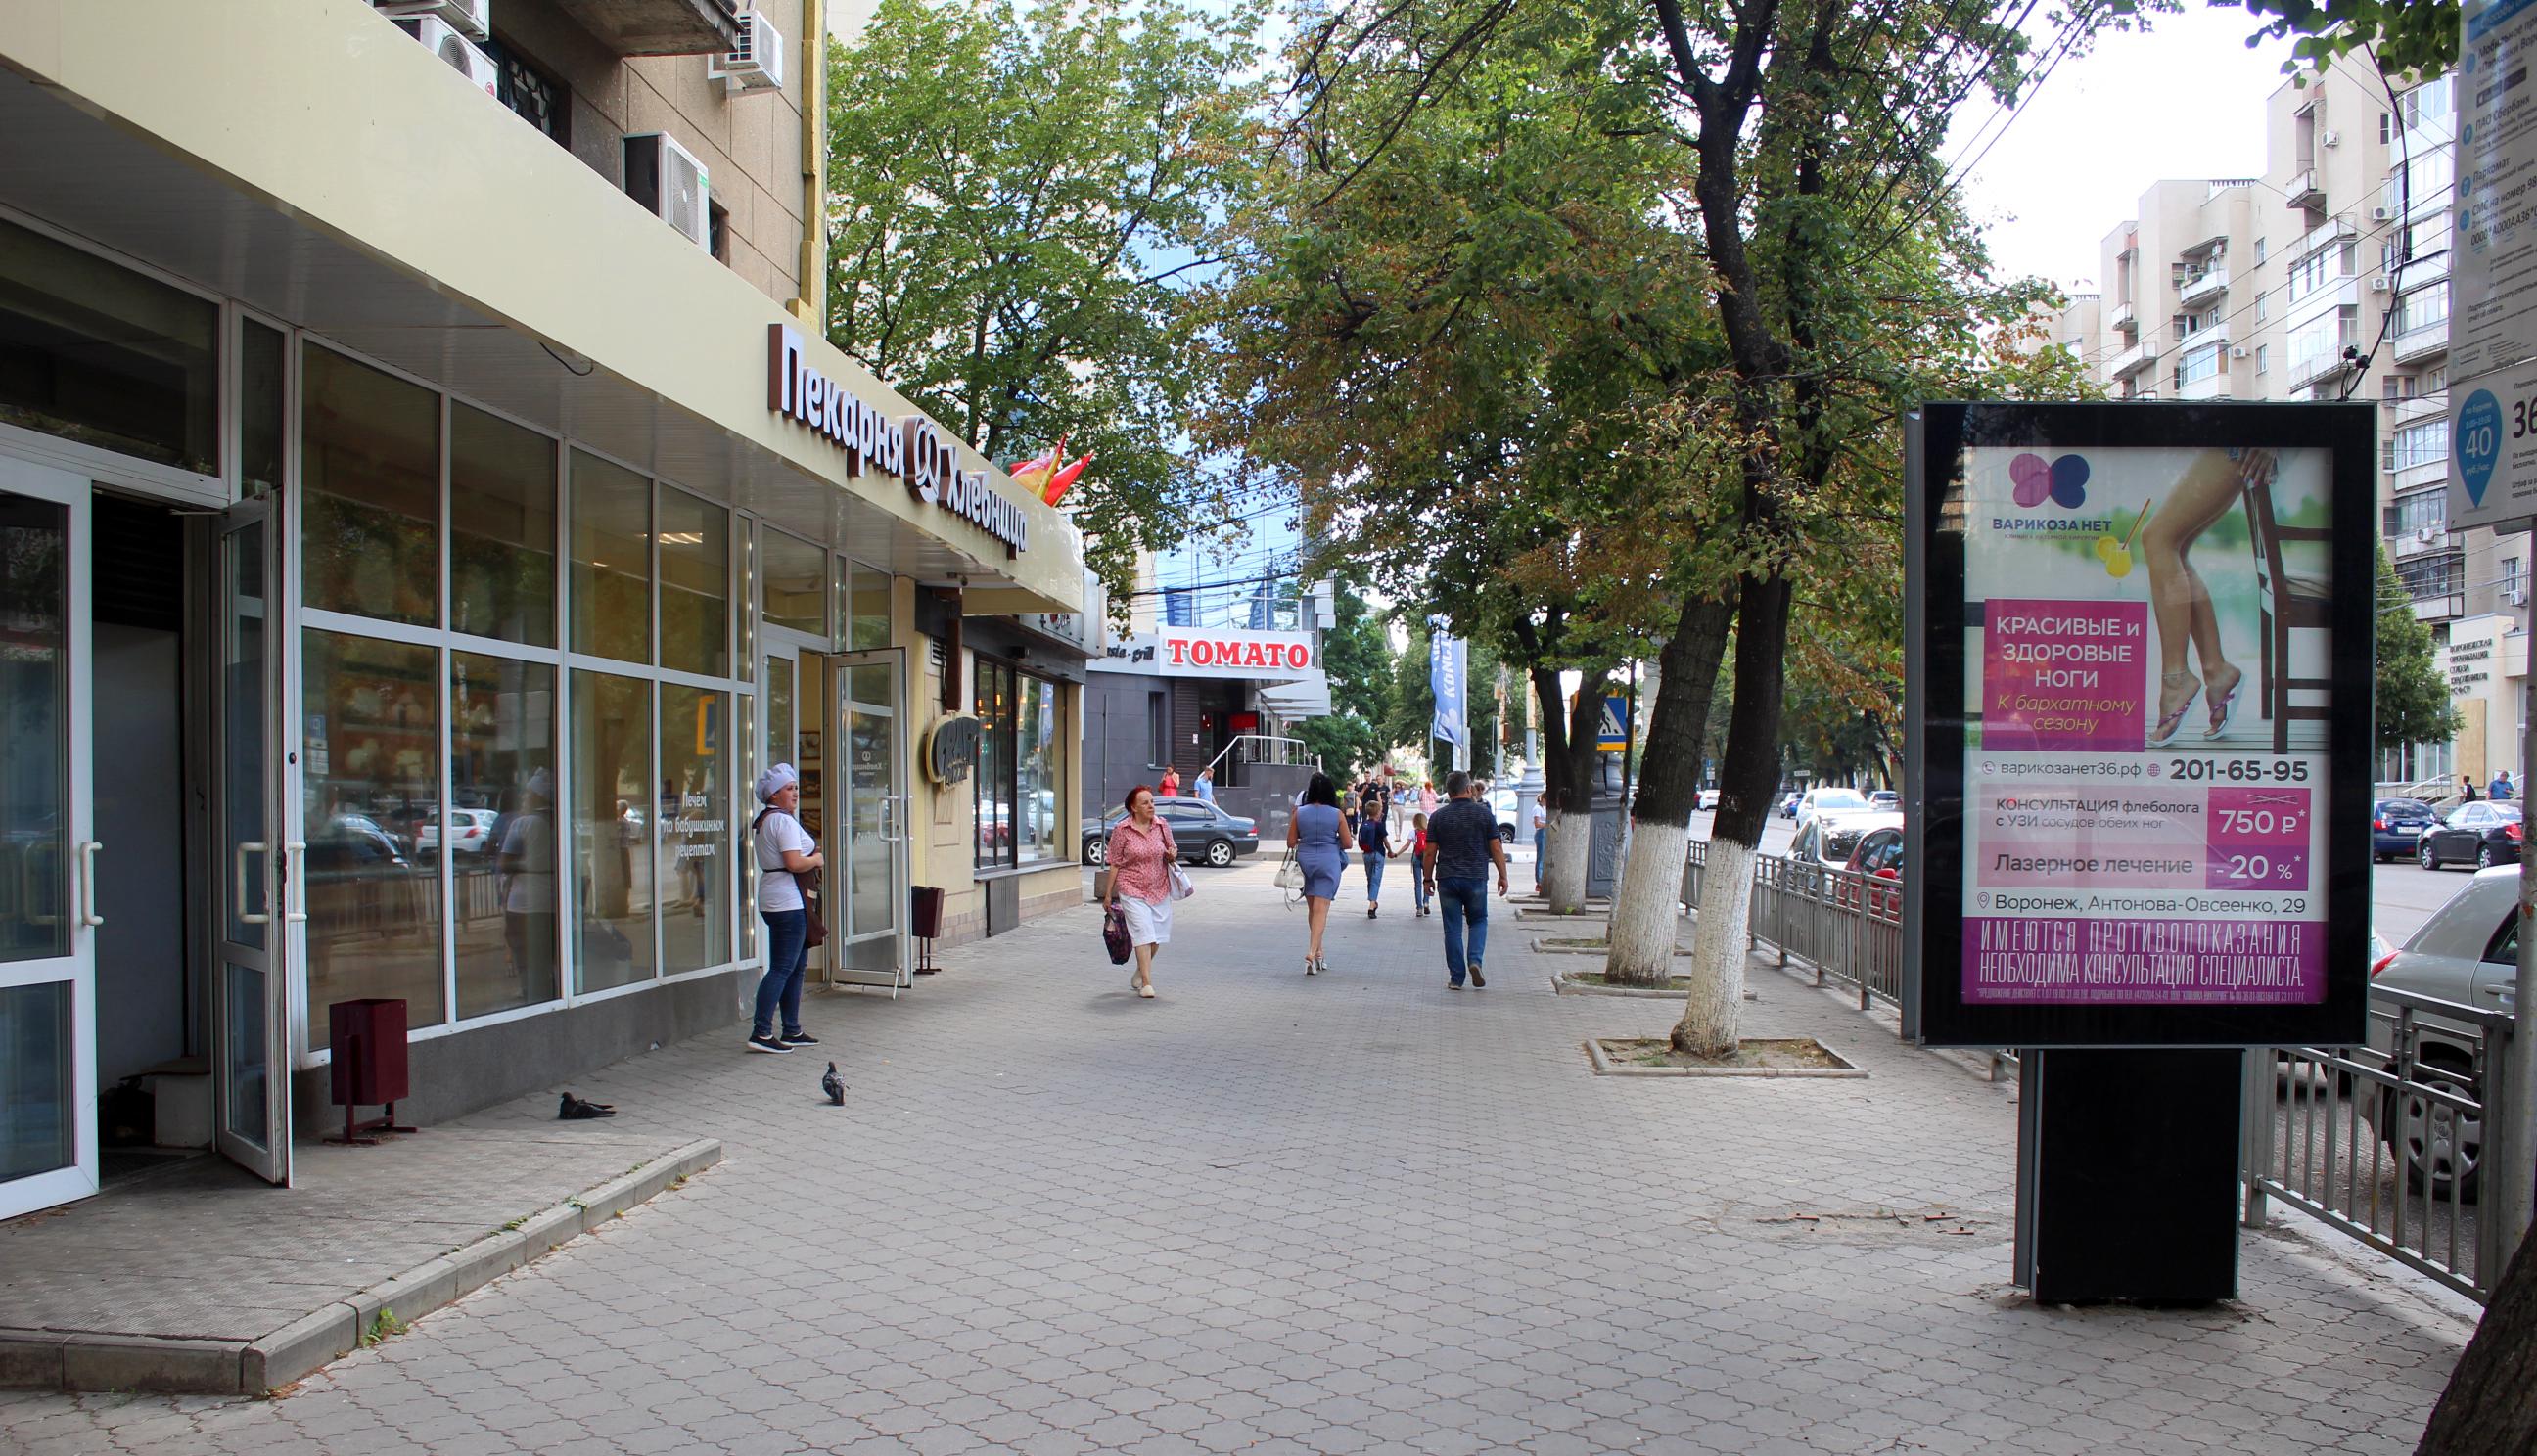 220В Ул. Кирова, поз. 6